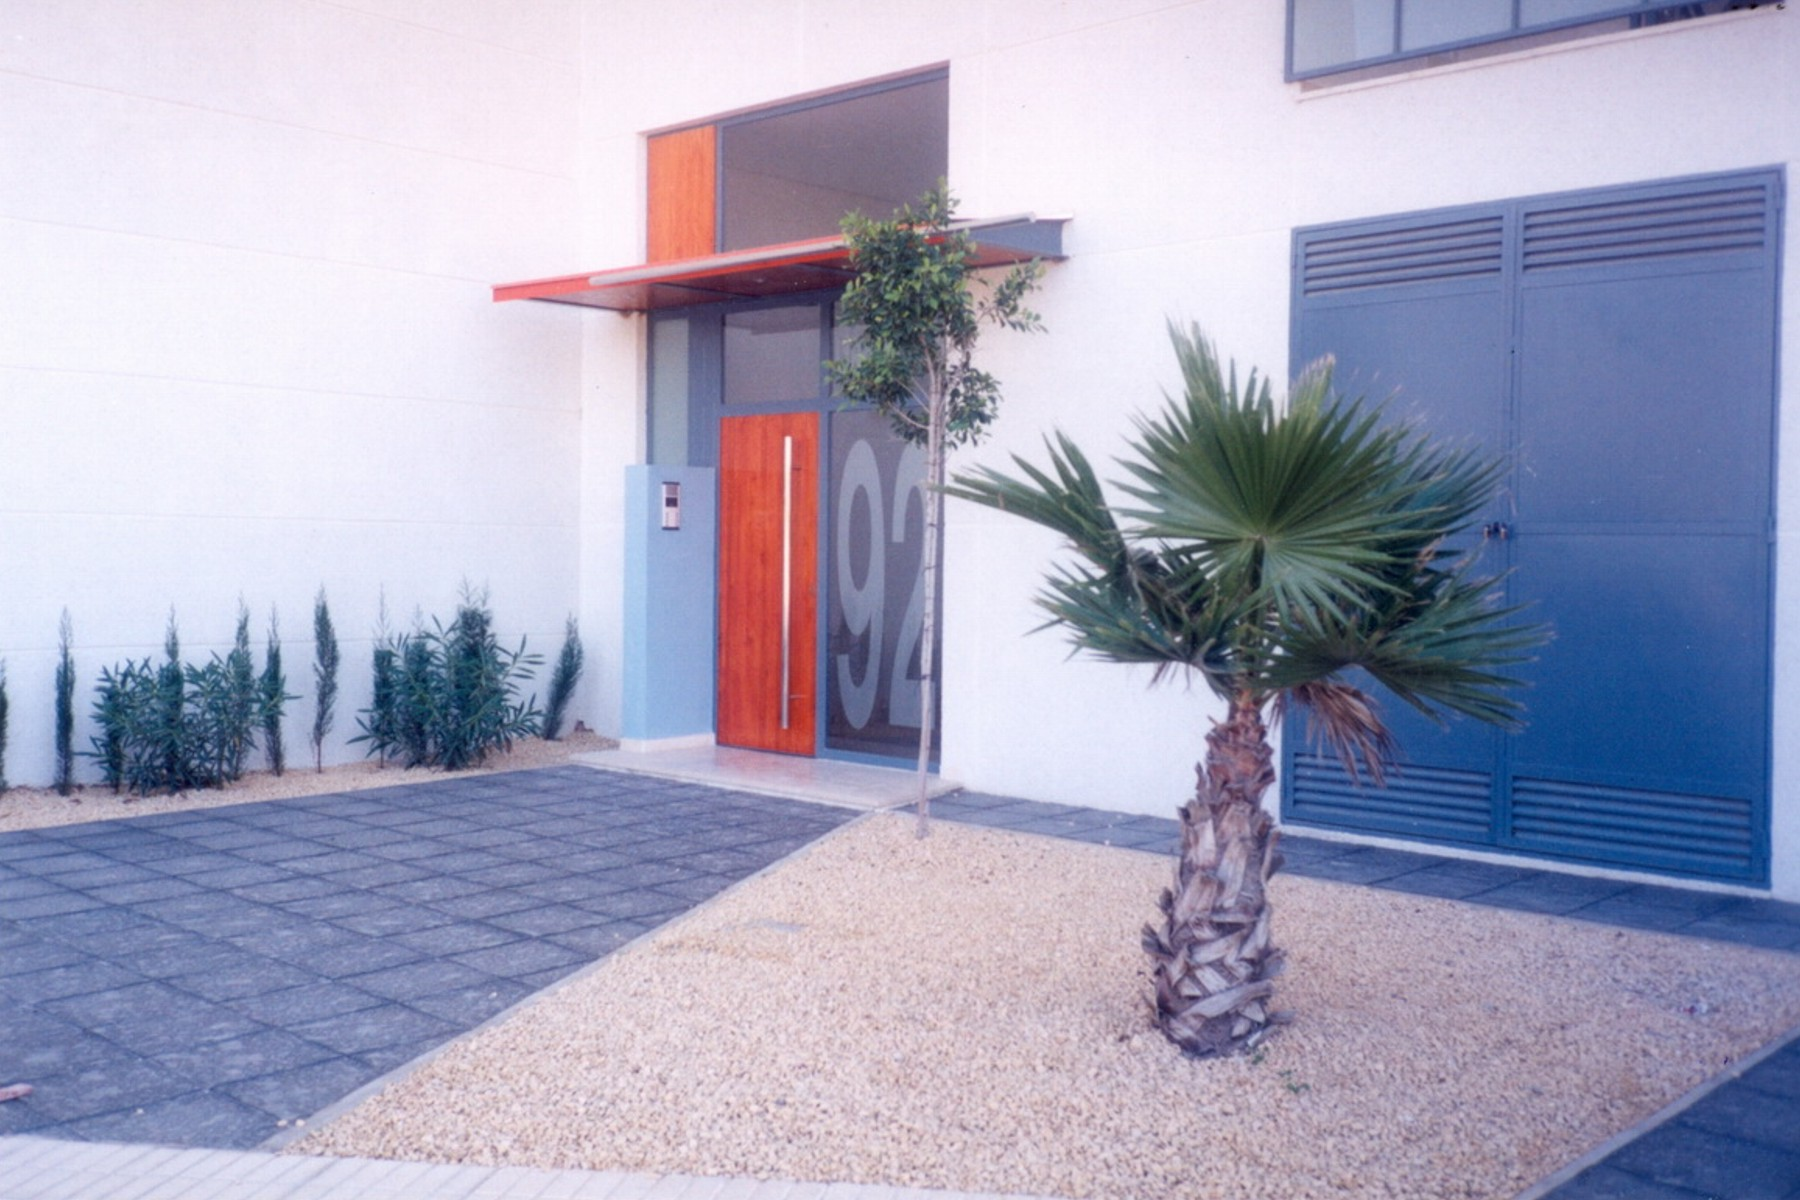 Imaginarq-053-Edificio-Viviendas-Altea-Alicante-10A